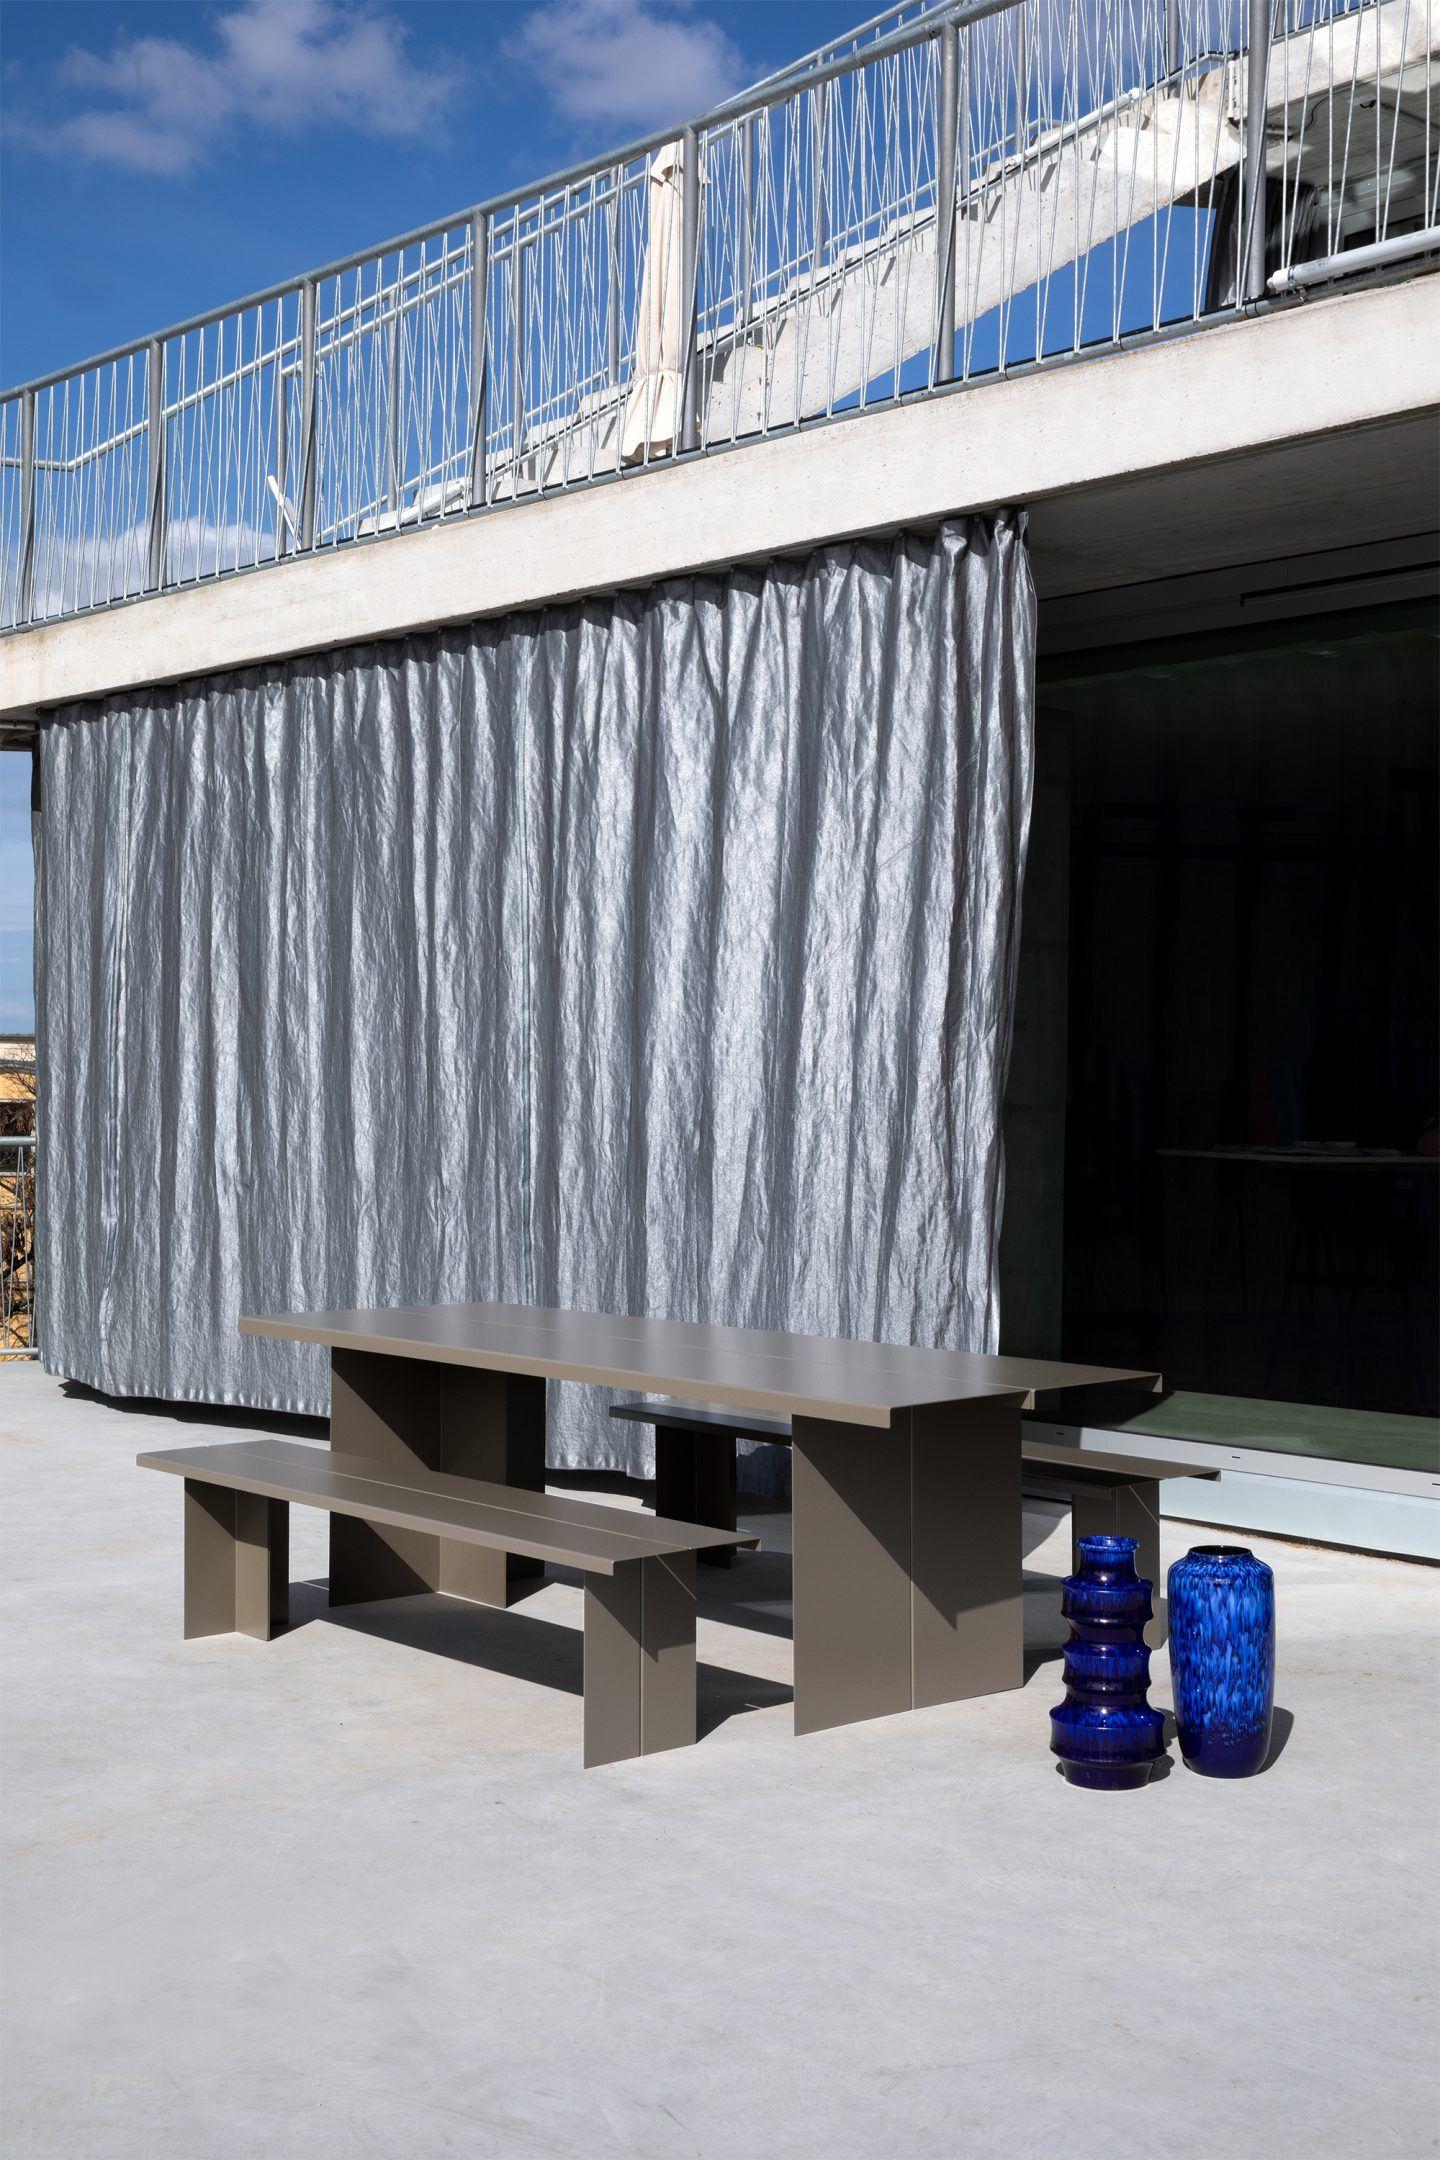 IGNANT-Design-Objekte-Unserer-Tage-Zebe-Table-2